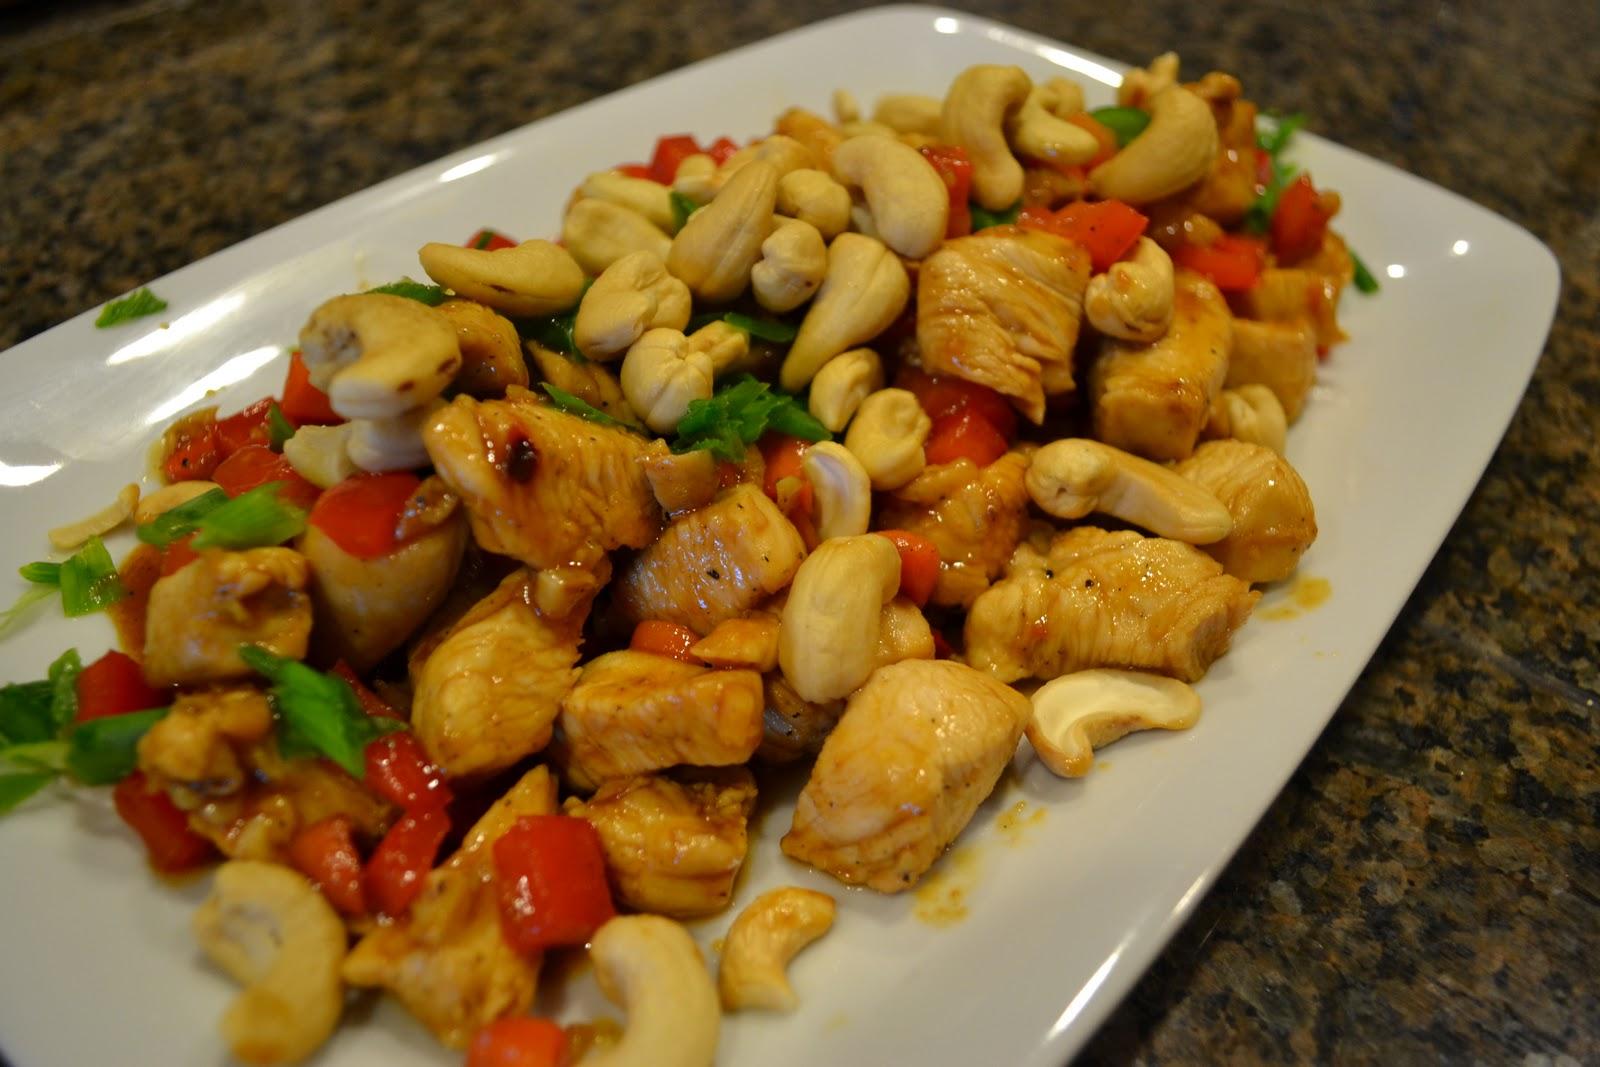 http://www.everythingrachaelray.com/2012/01/its-keeper-cashew-chicken.html